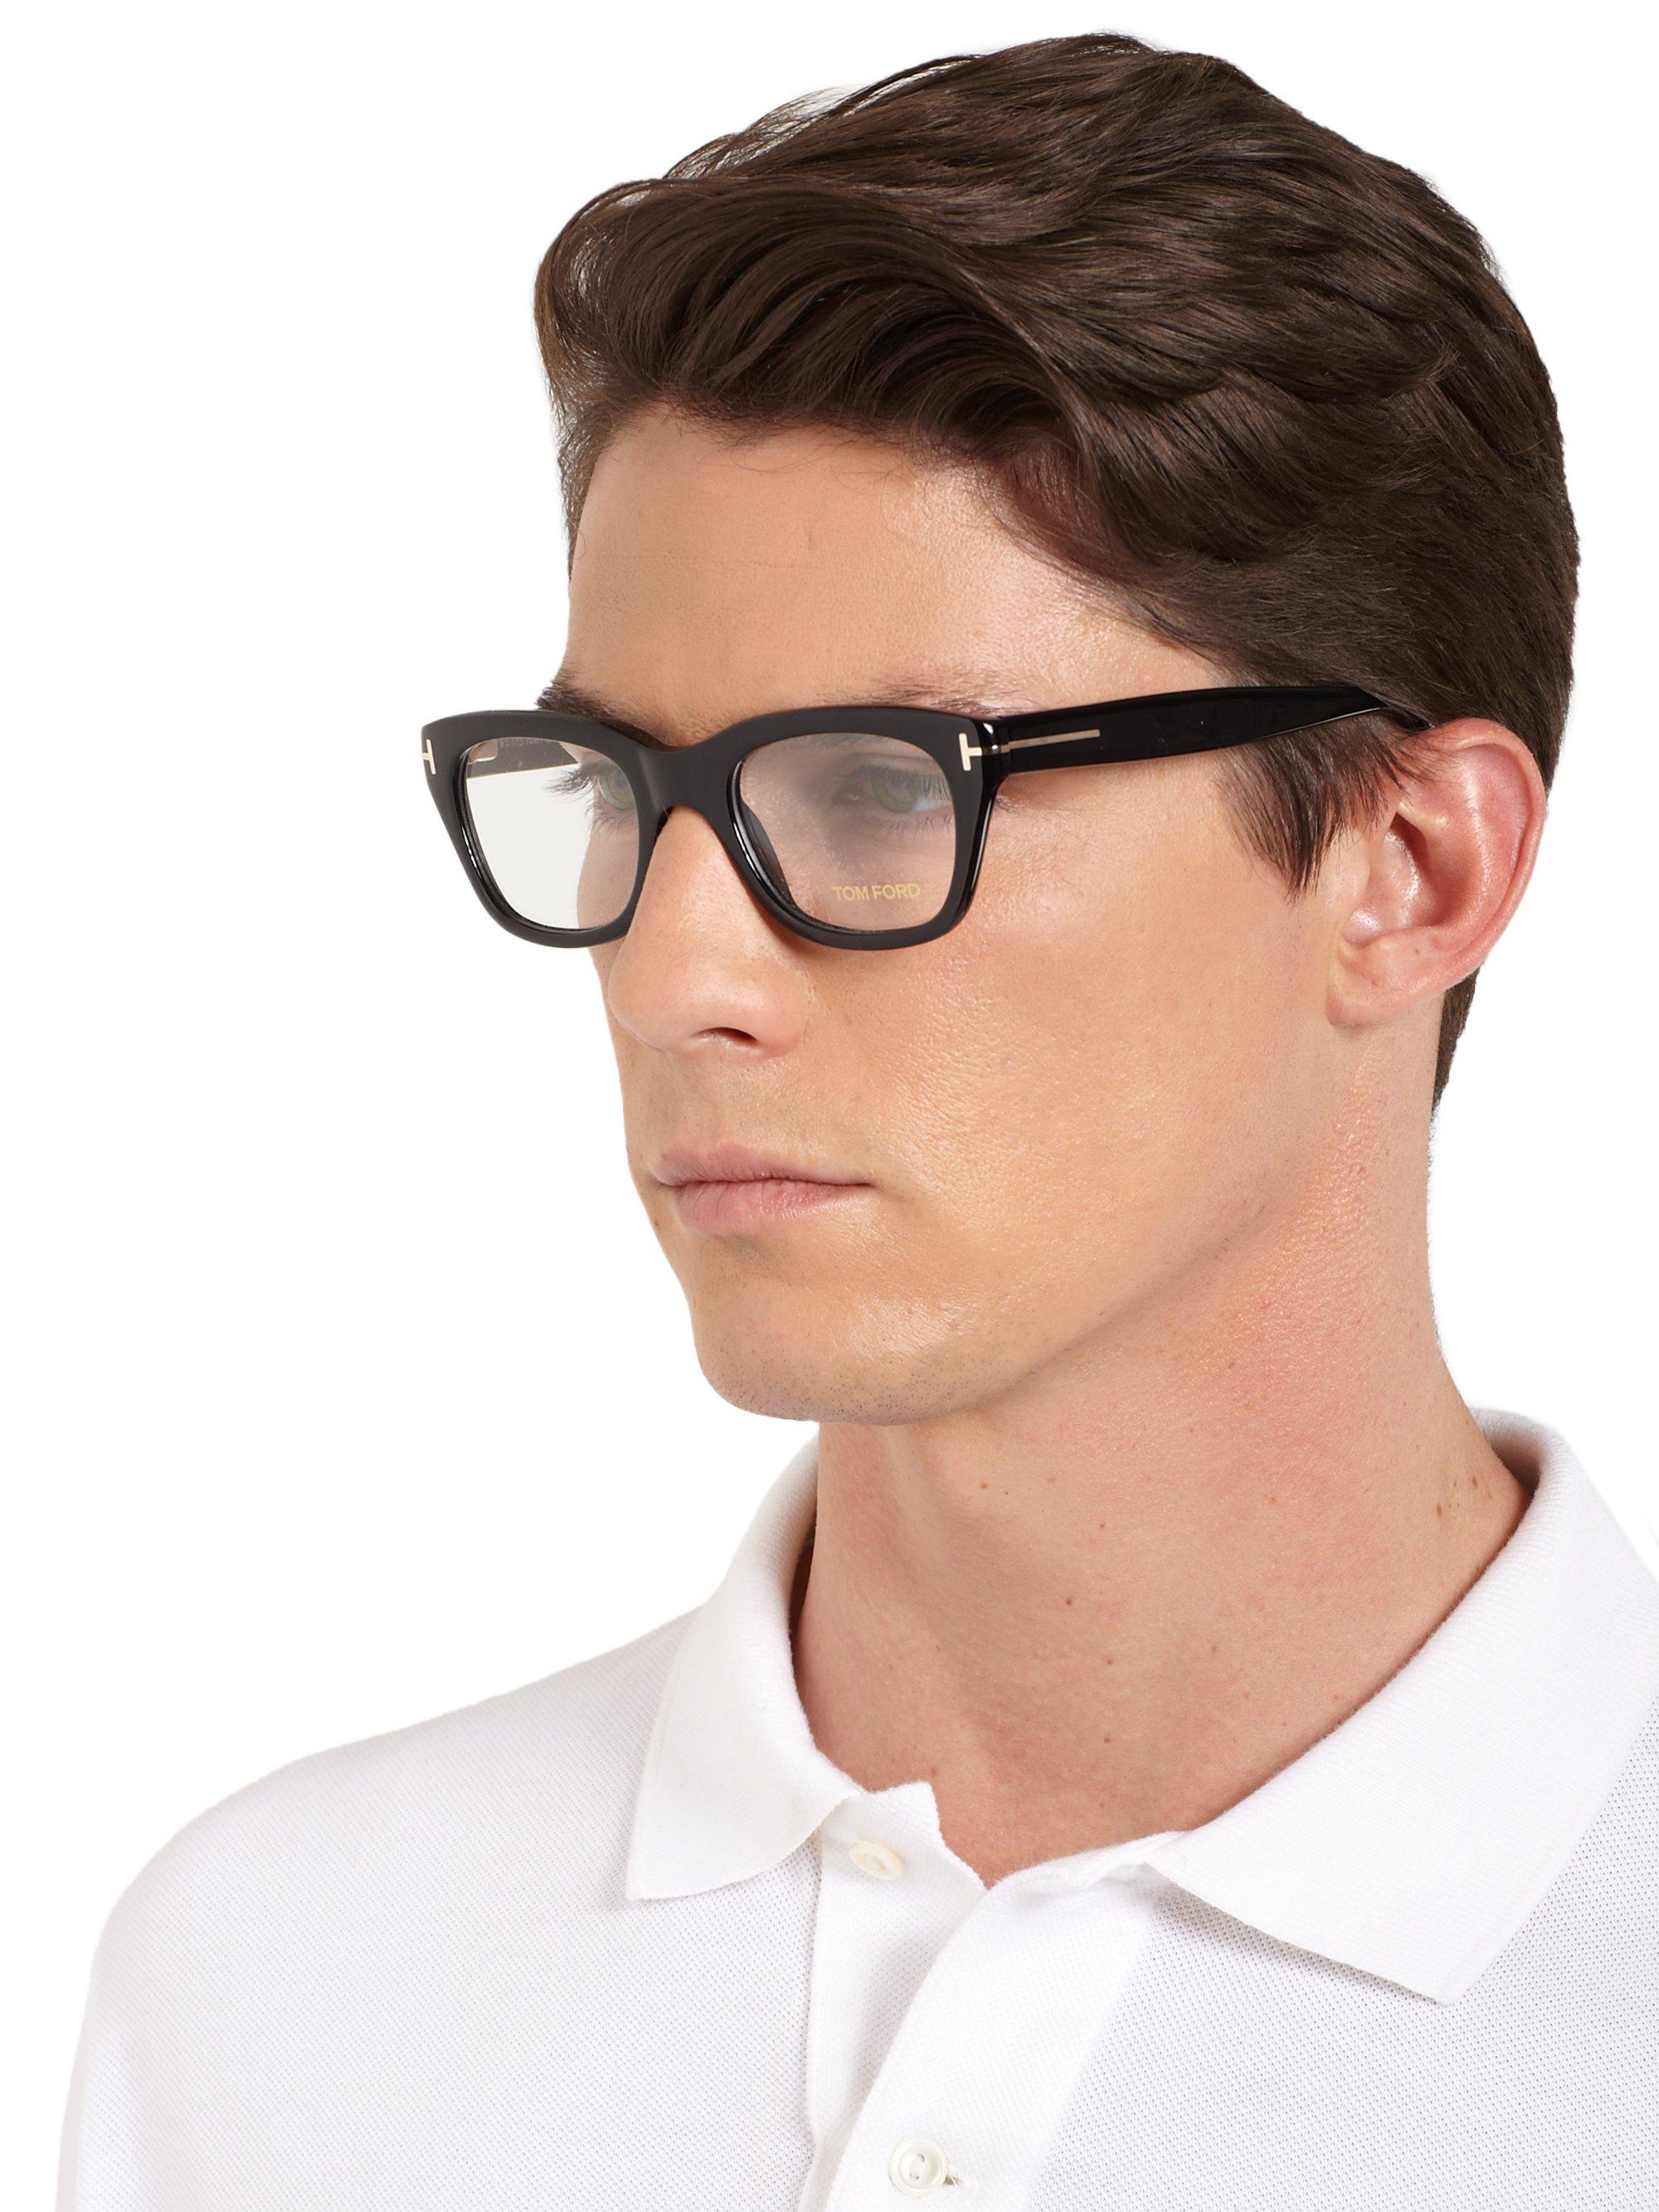 c478a14045c Tom Ford 5178 Square Optical Frames in Black for Men - Lyst